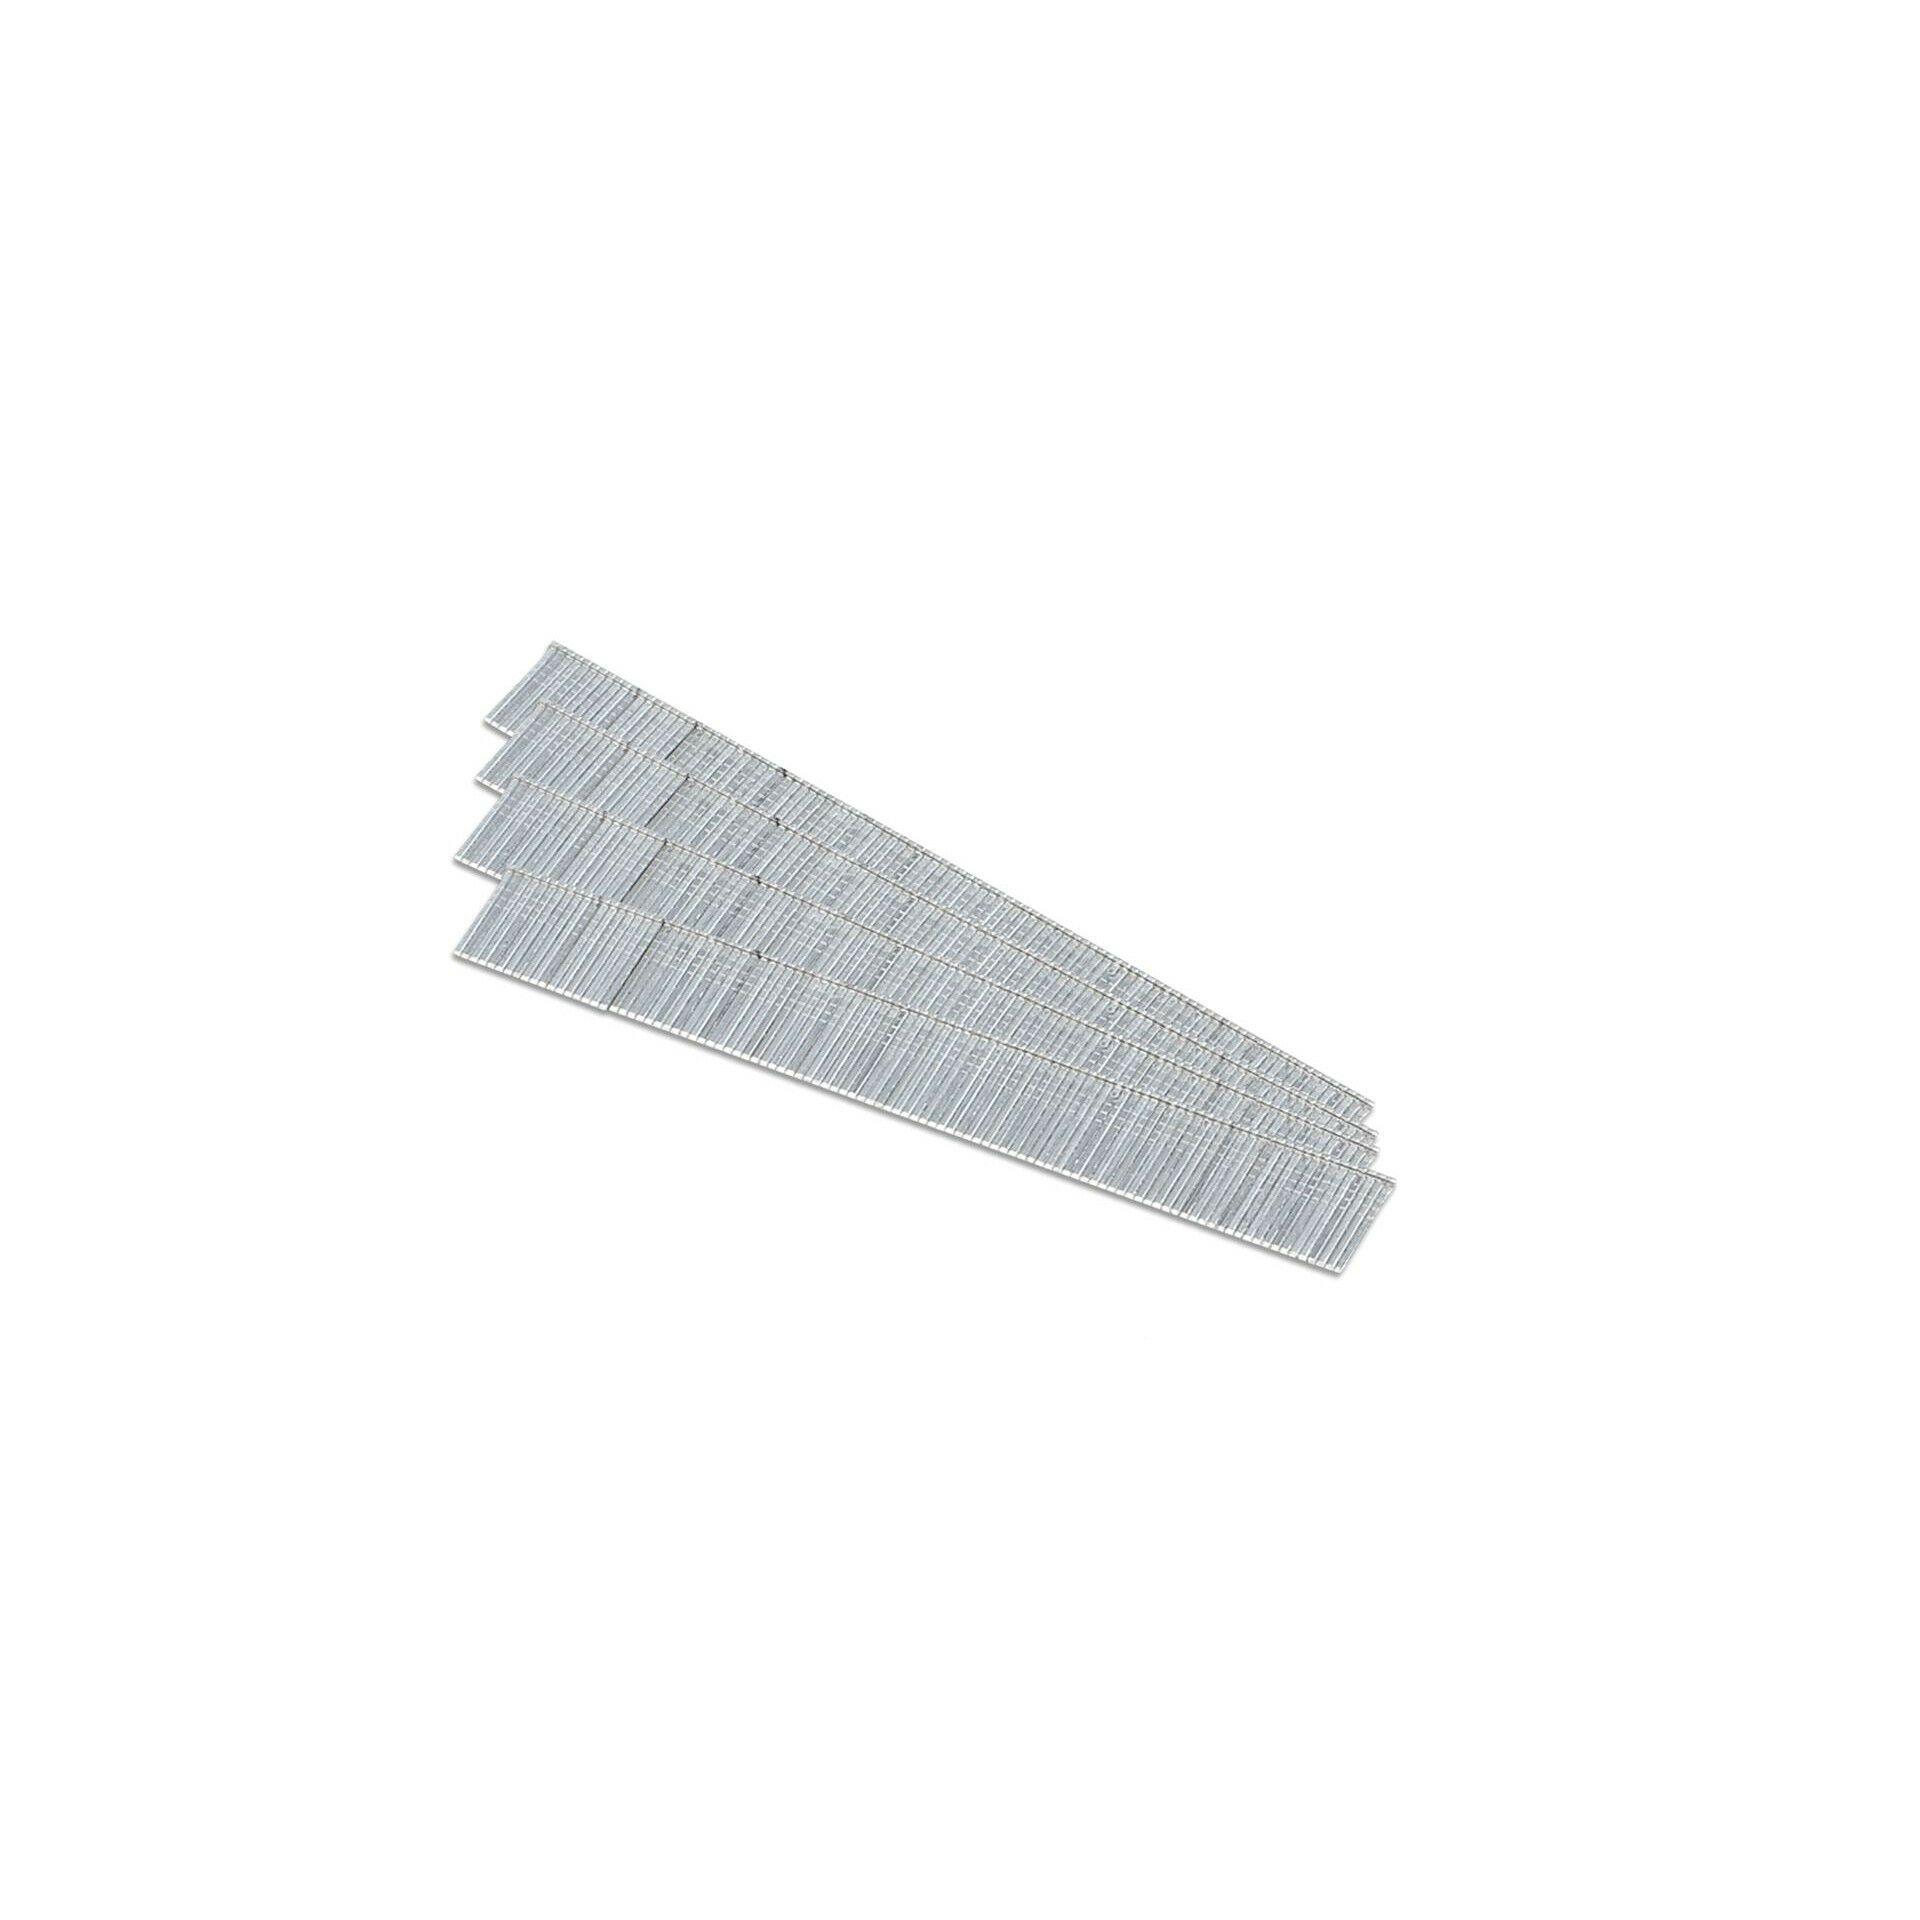 1000 Spijkers voor nagelapparaat Powerplus POWAIR0311 | Stalen nagels 50 mm